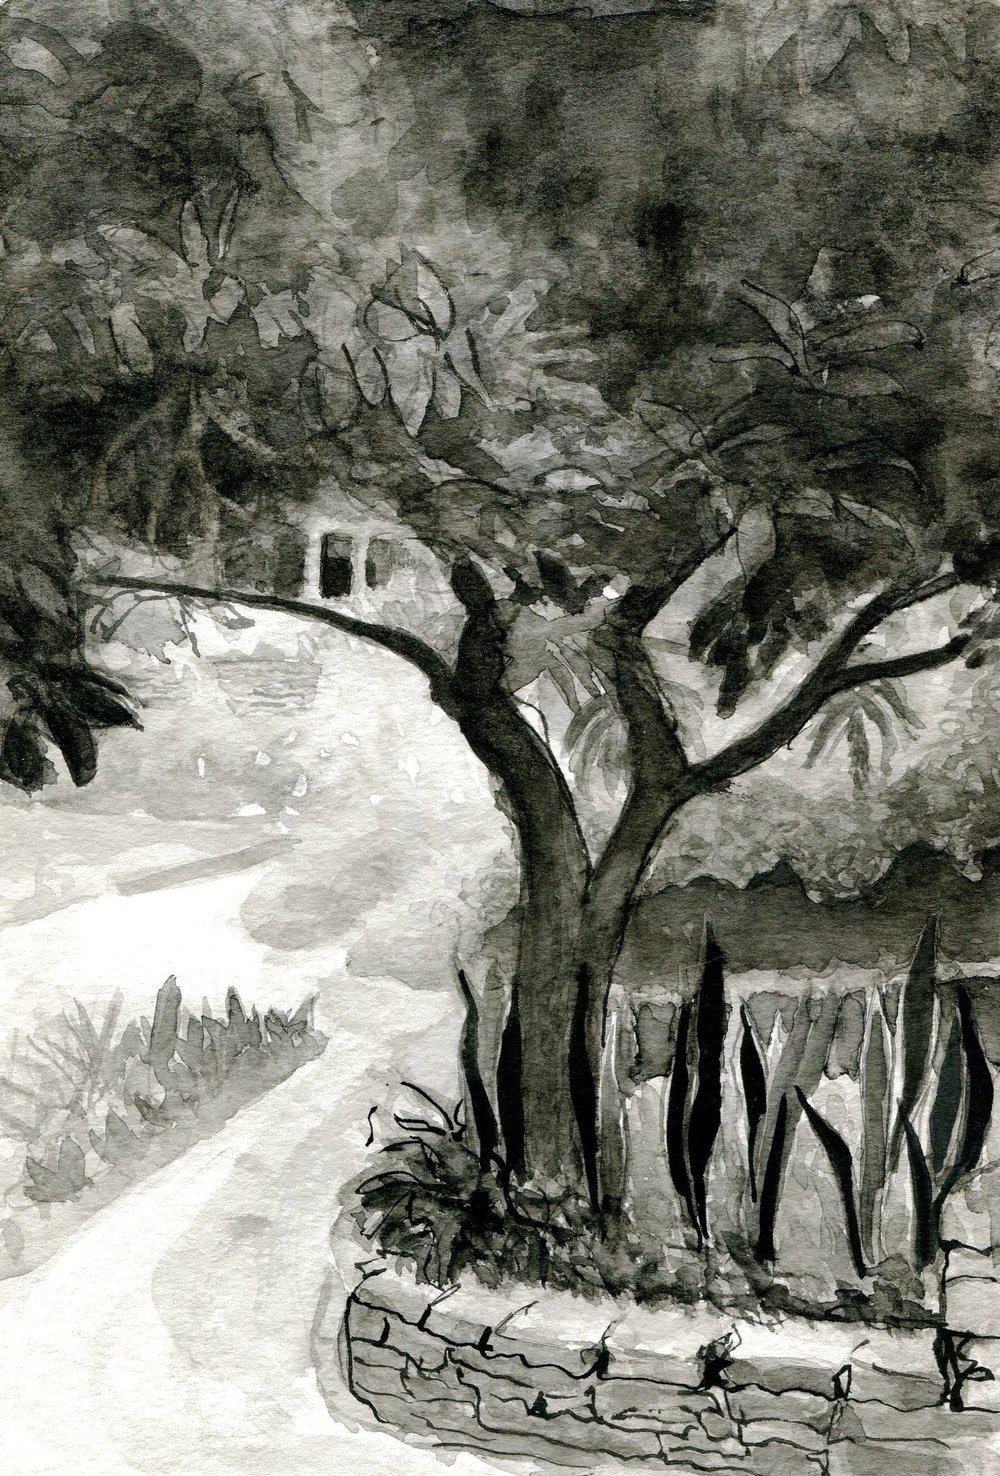 93a Jennie Milborrow, The Garden, Brush & ink on paper